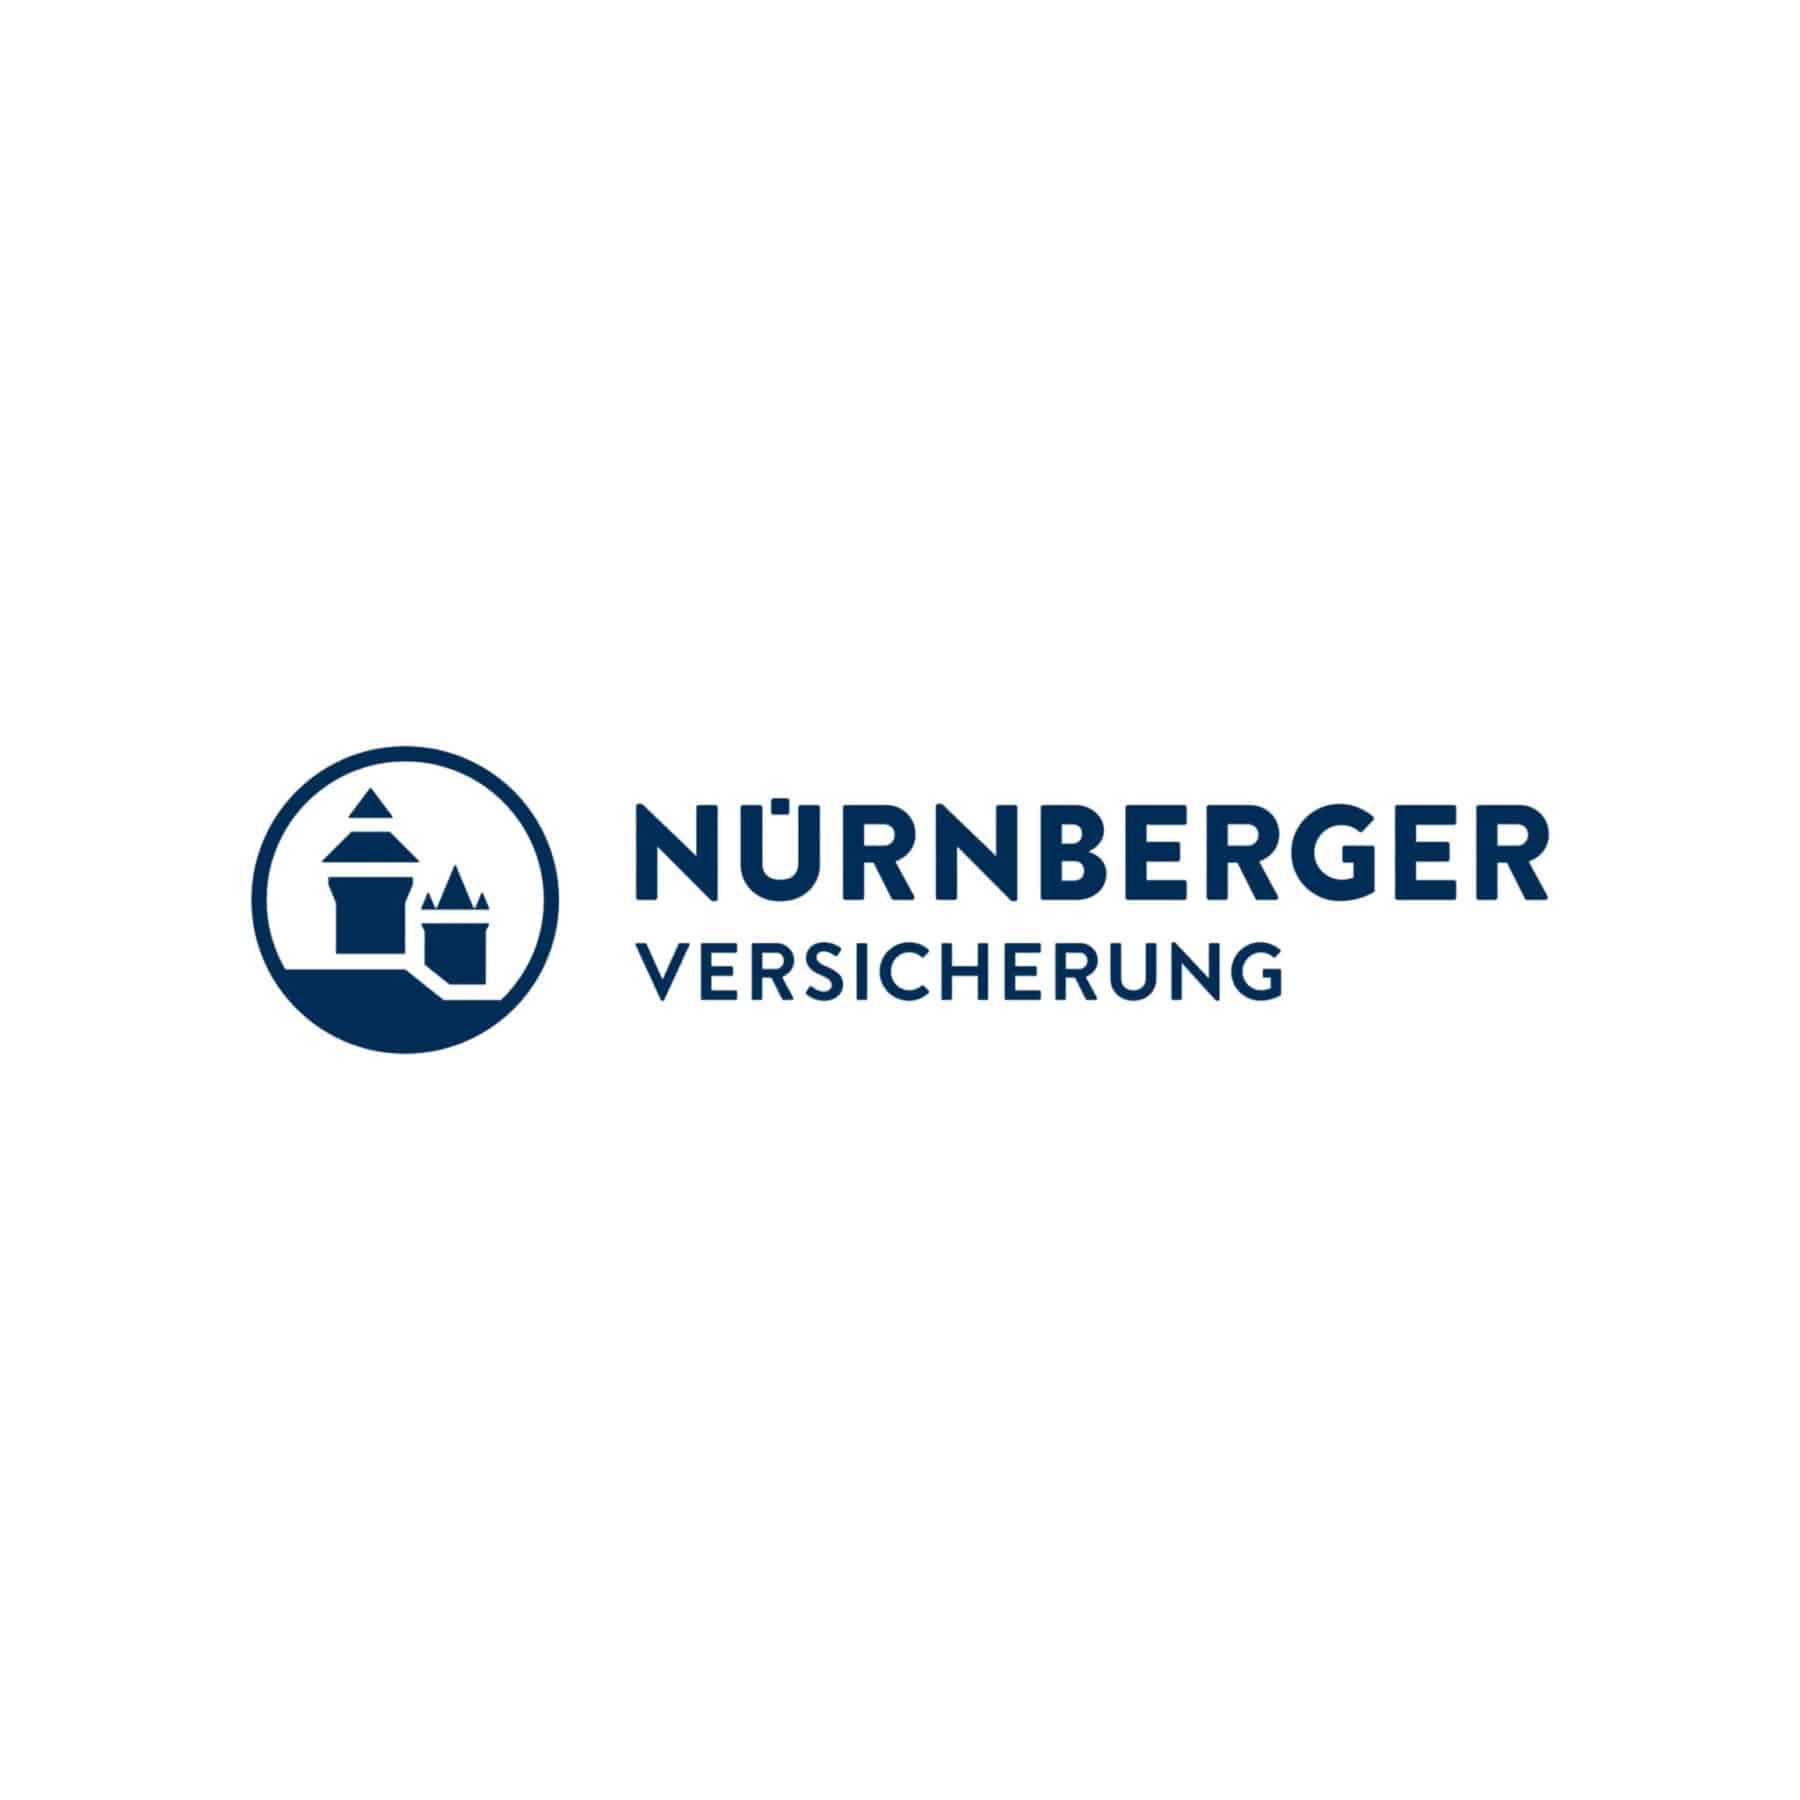 Nürnberger Logo